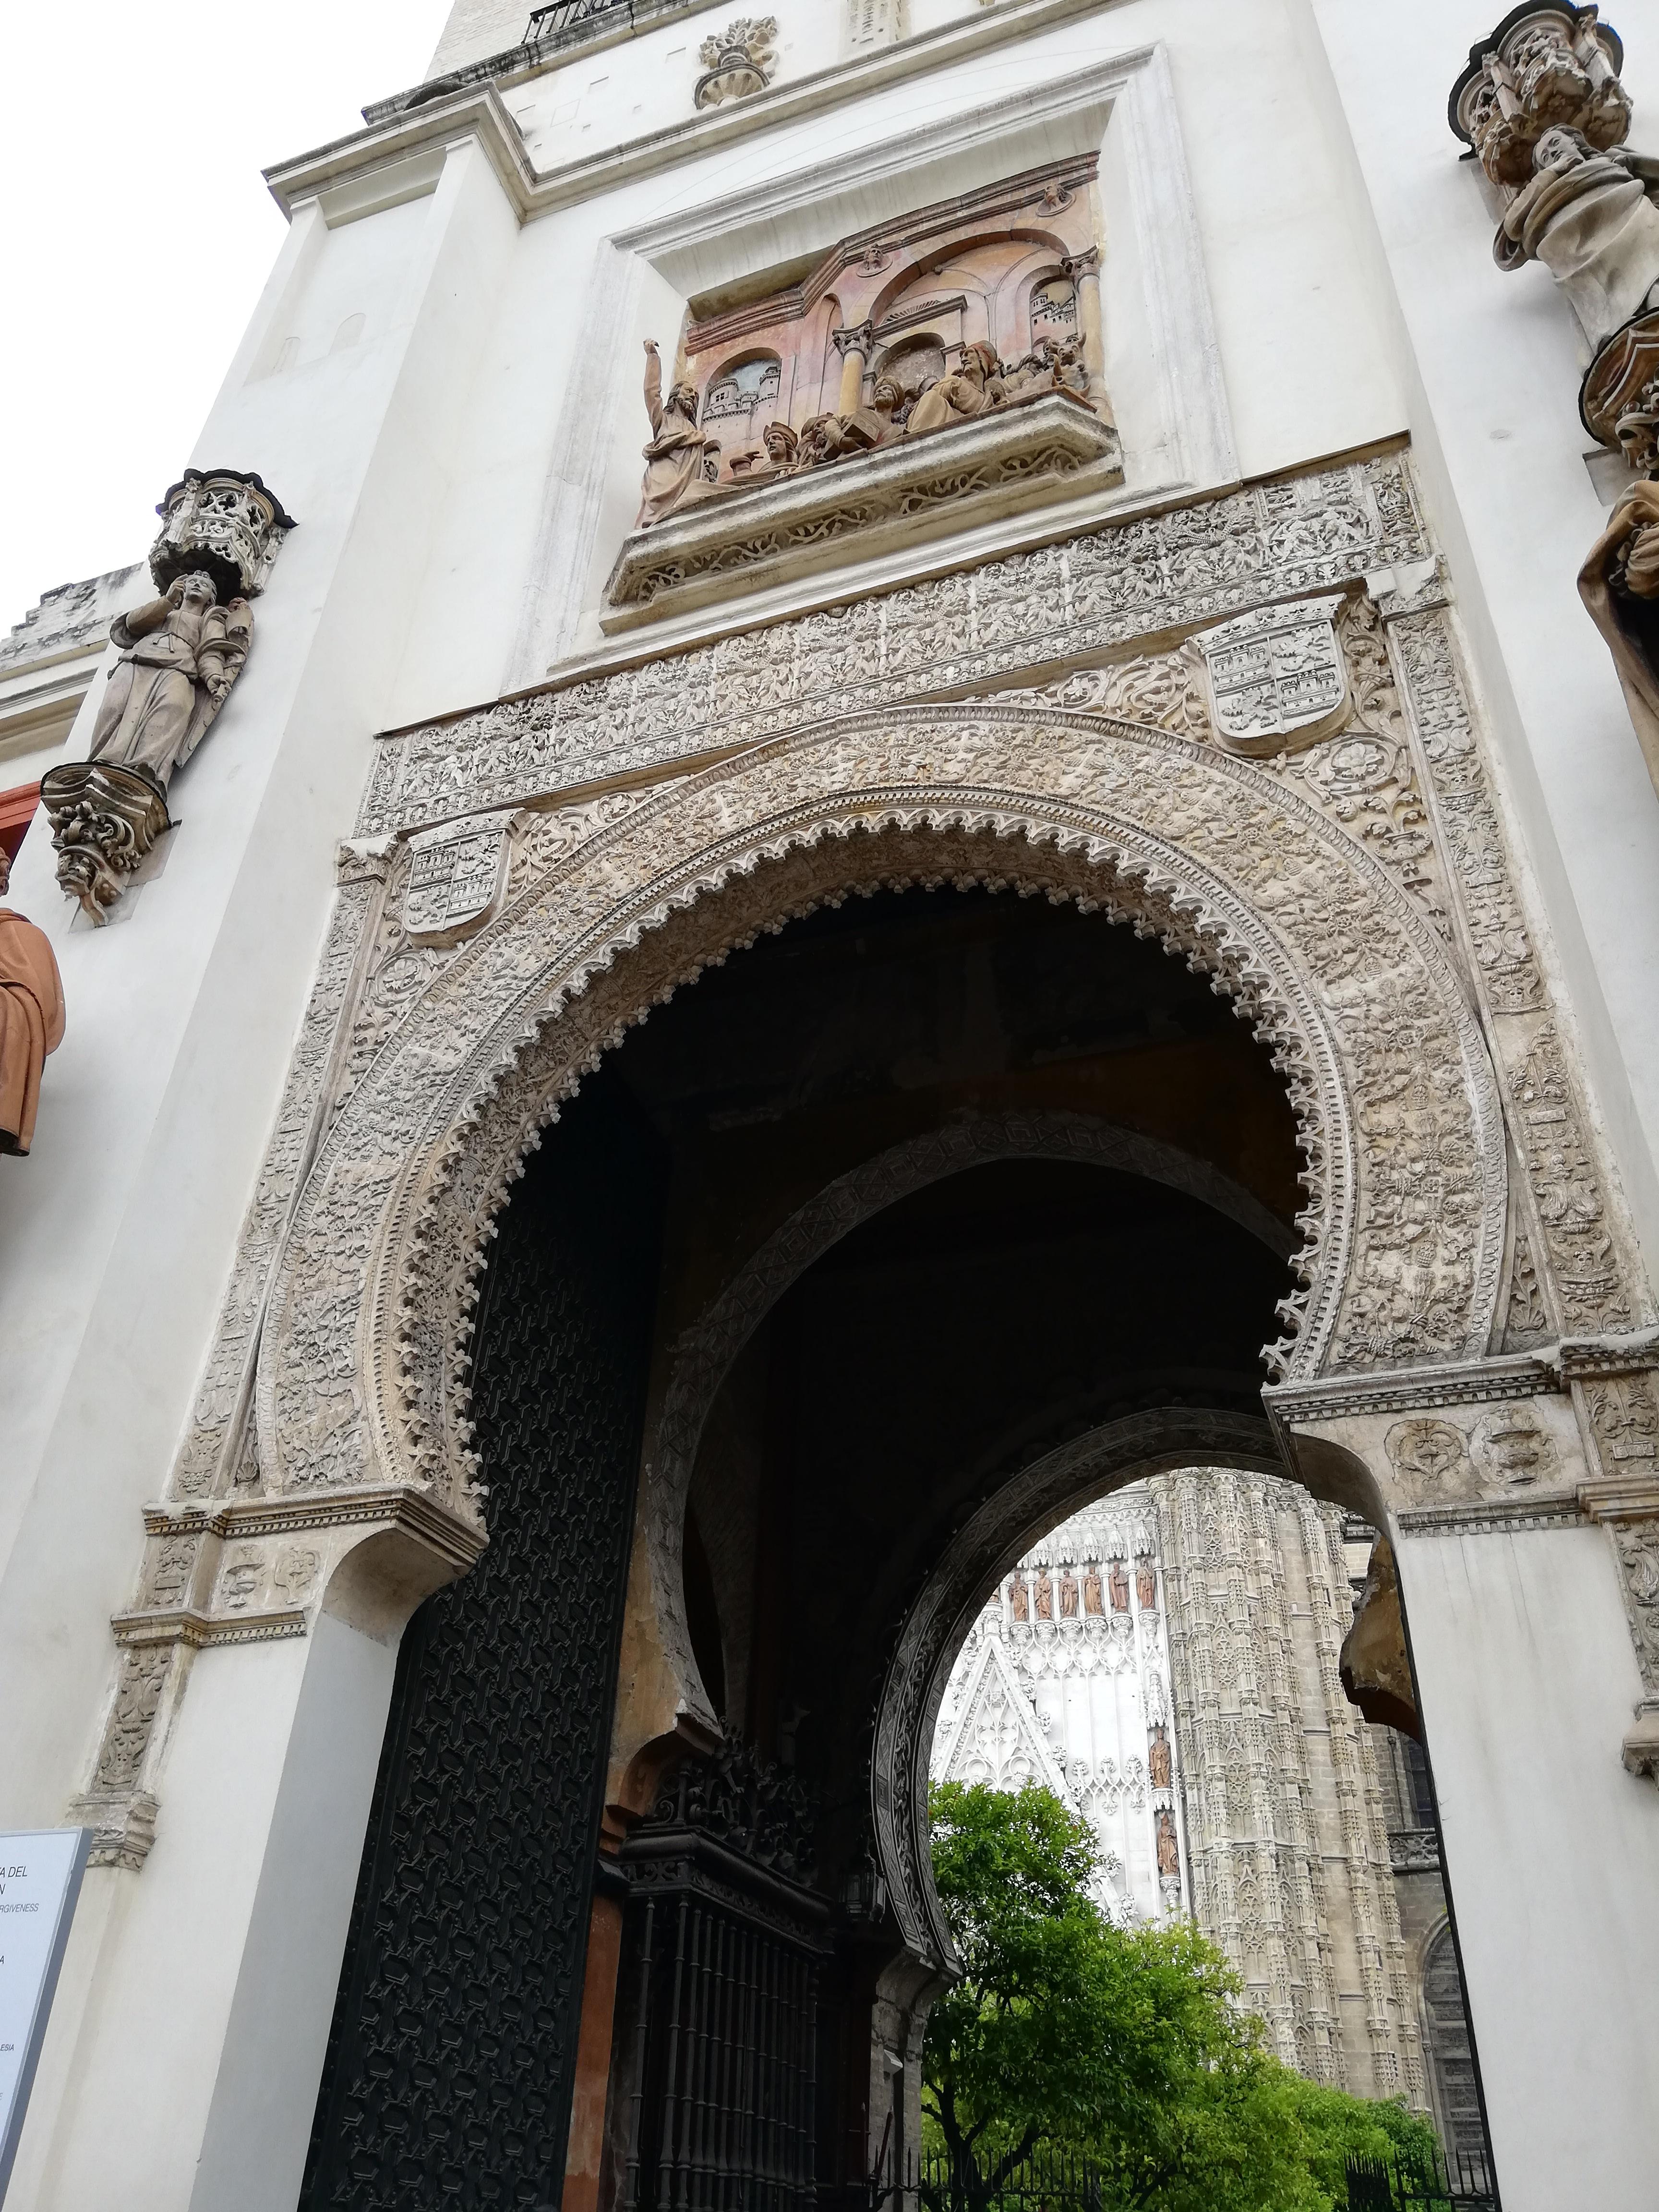 Puerta del perdon - siviglia